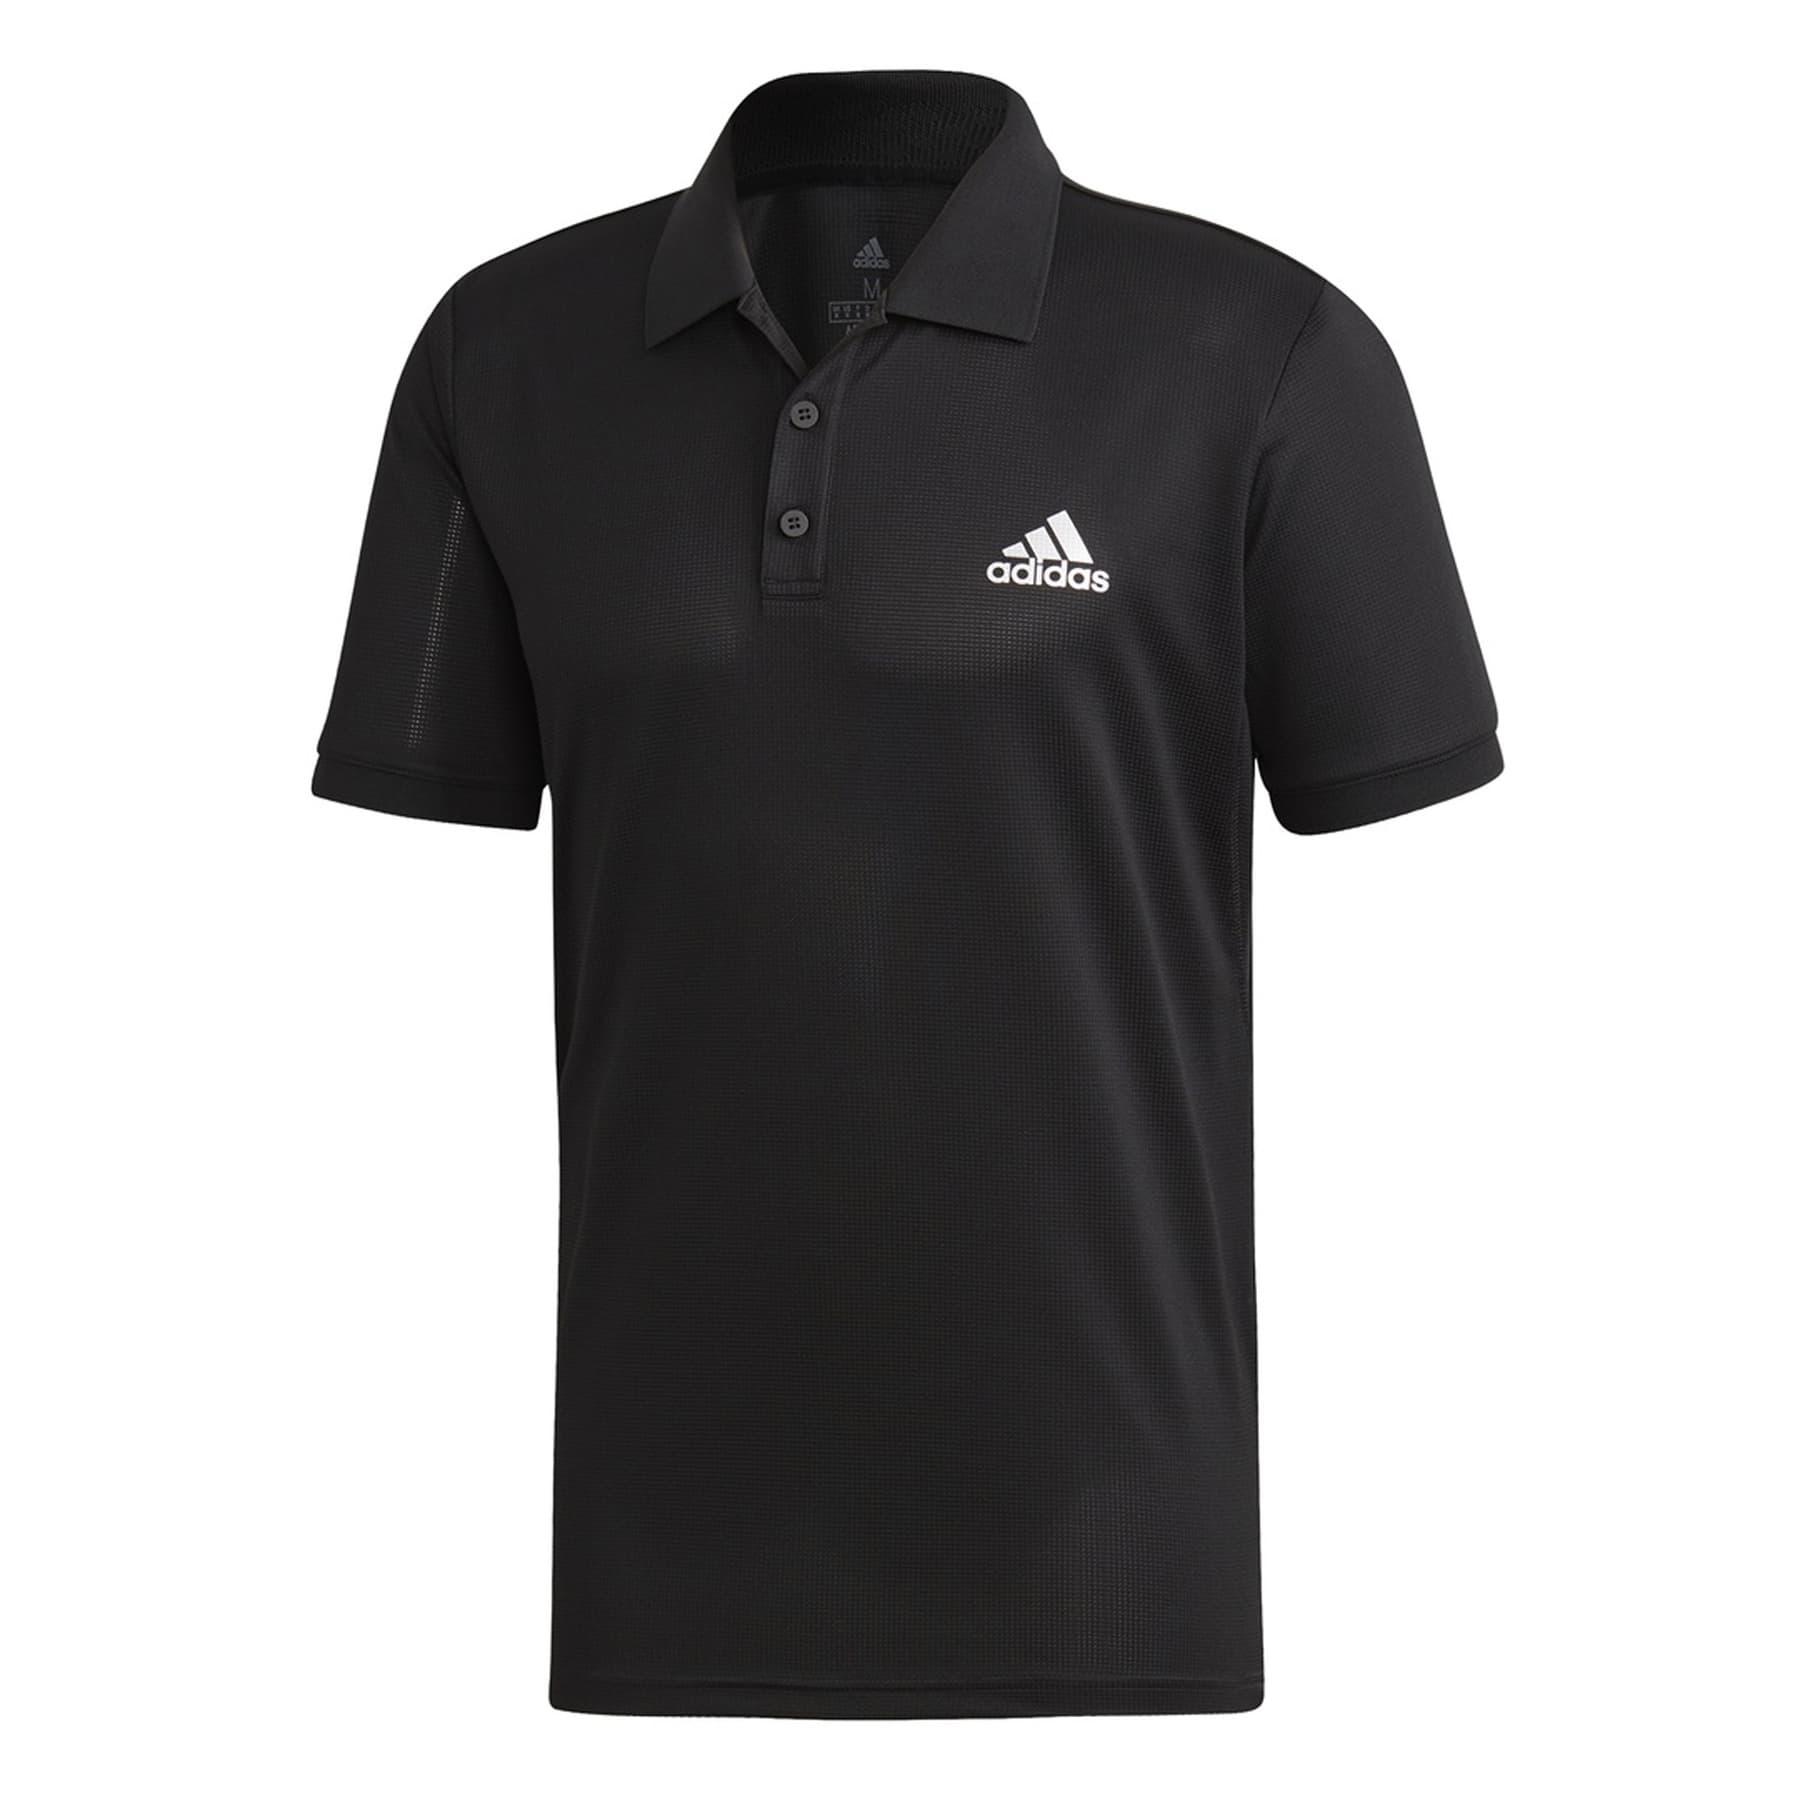 Club Solid Polo Yaka Erkek Siyah Spor Tişört